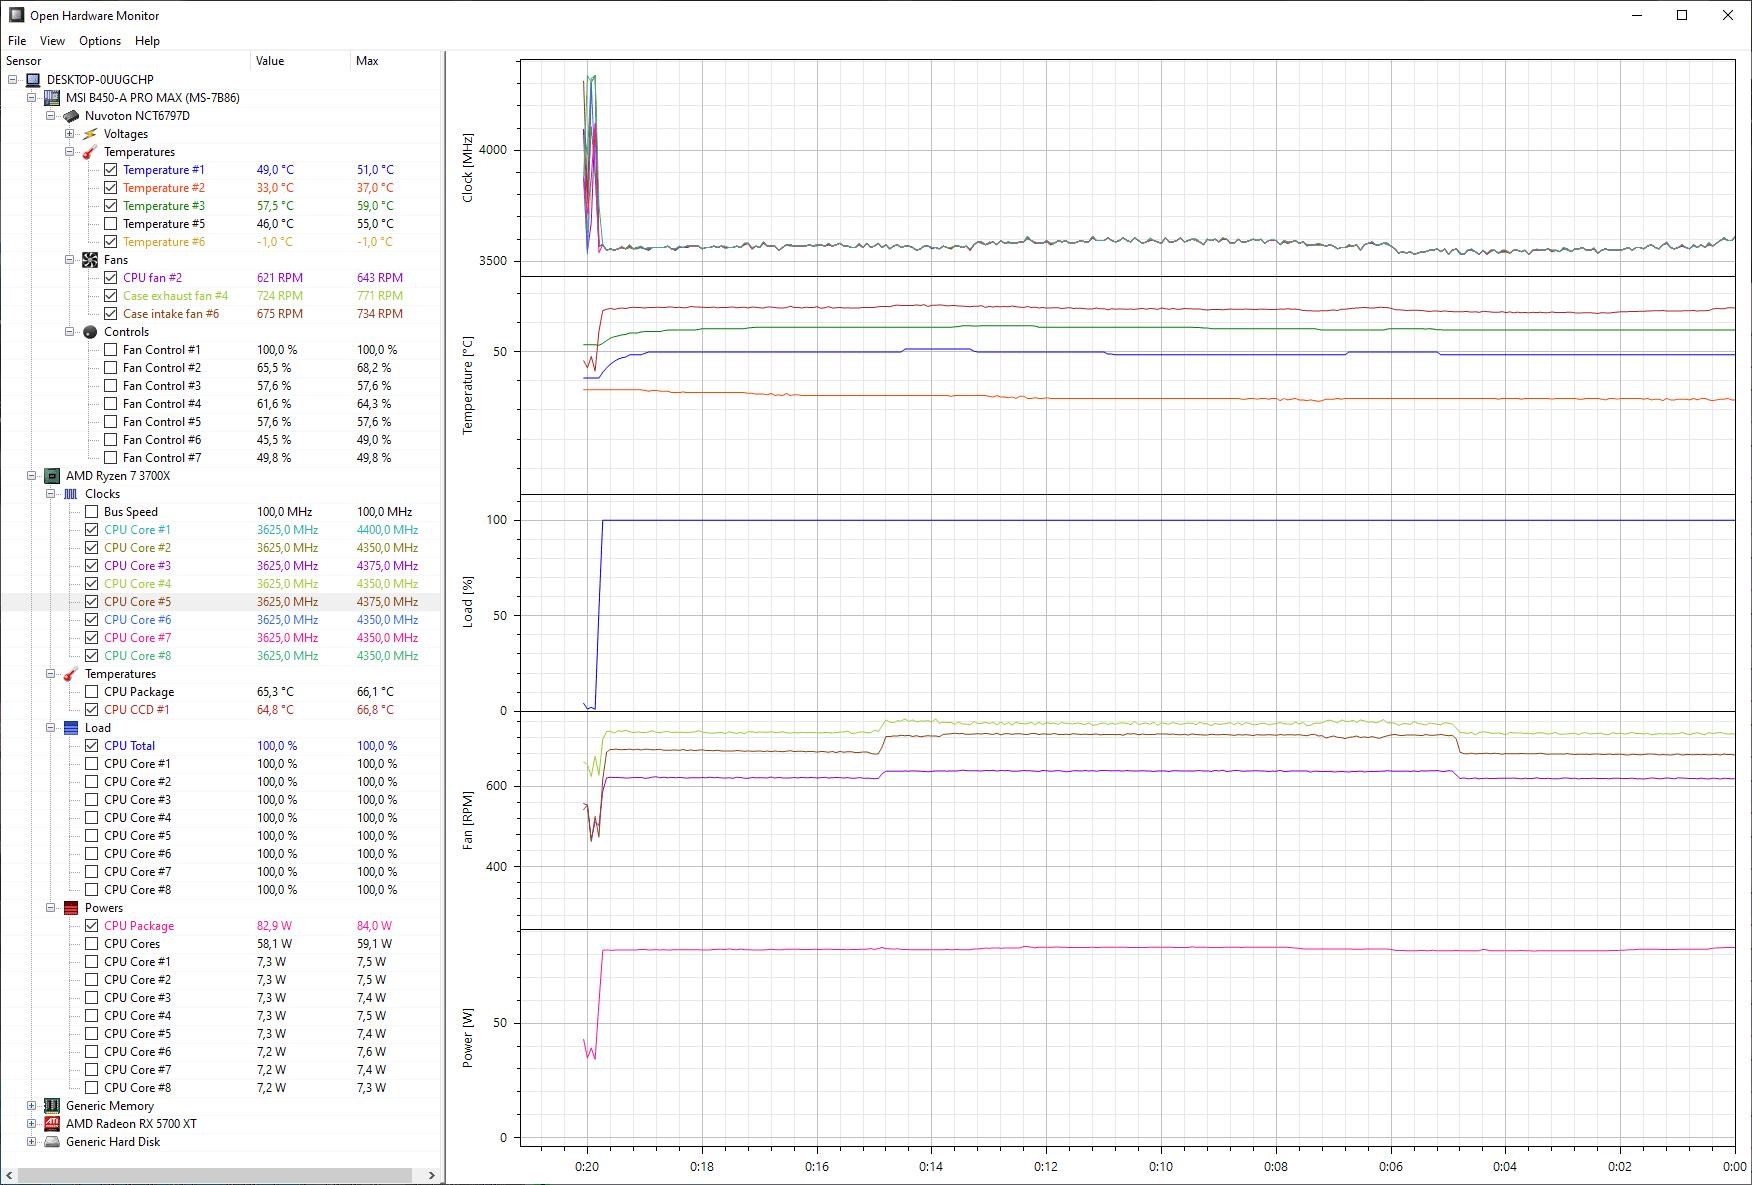 https://tweakers.net/i/dEoUqDz7OwJIWRk9UgnQNMZ0ack=/full-fit-in/4000x4000/filters:no_upscale():fill(white):strip_exif()/f/image/LDCfRD3TZYCs1uVrGrnw7HTg.png?f=user_large